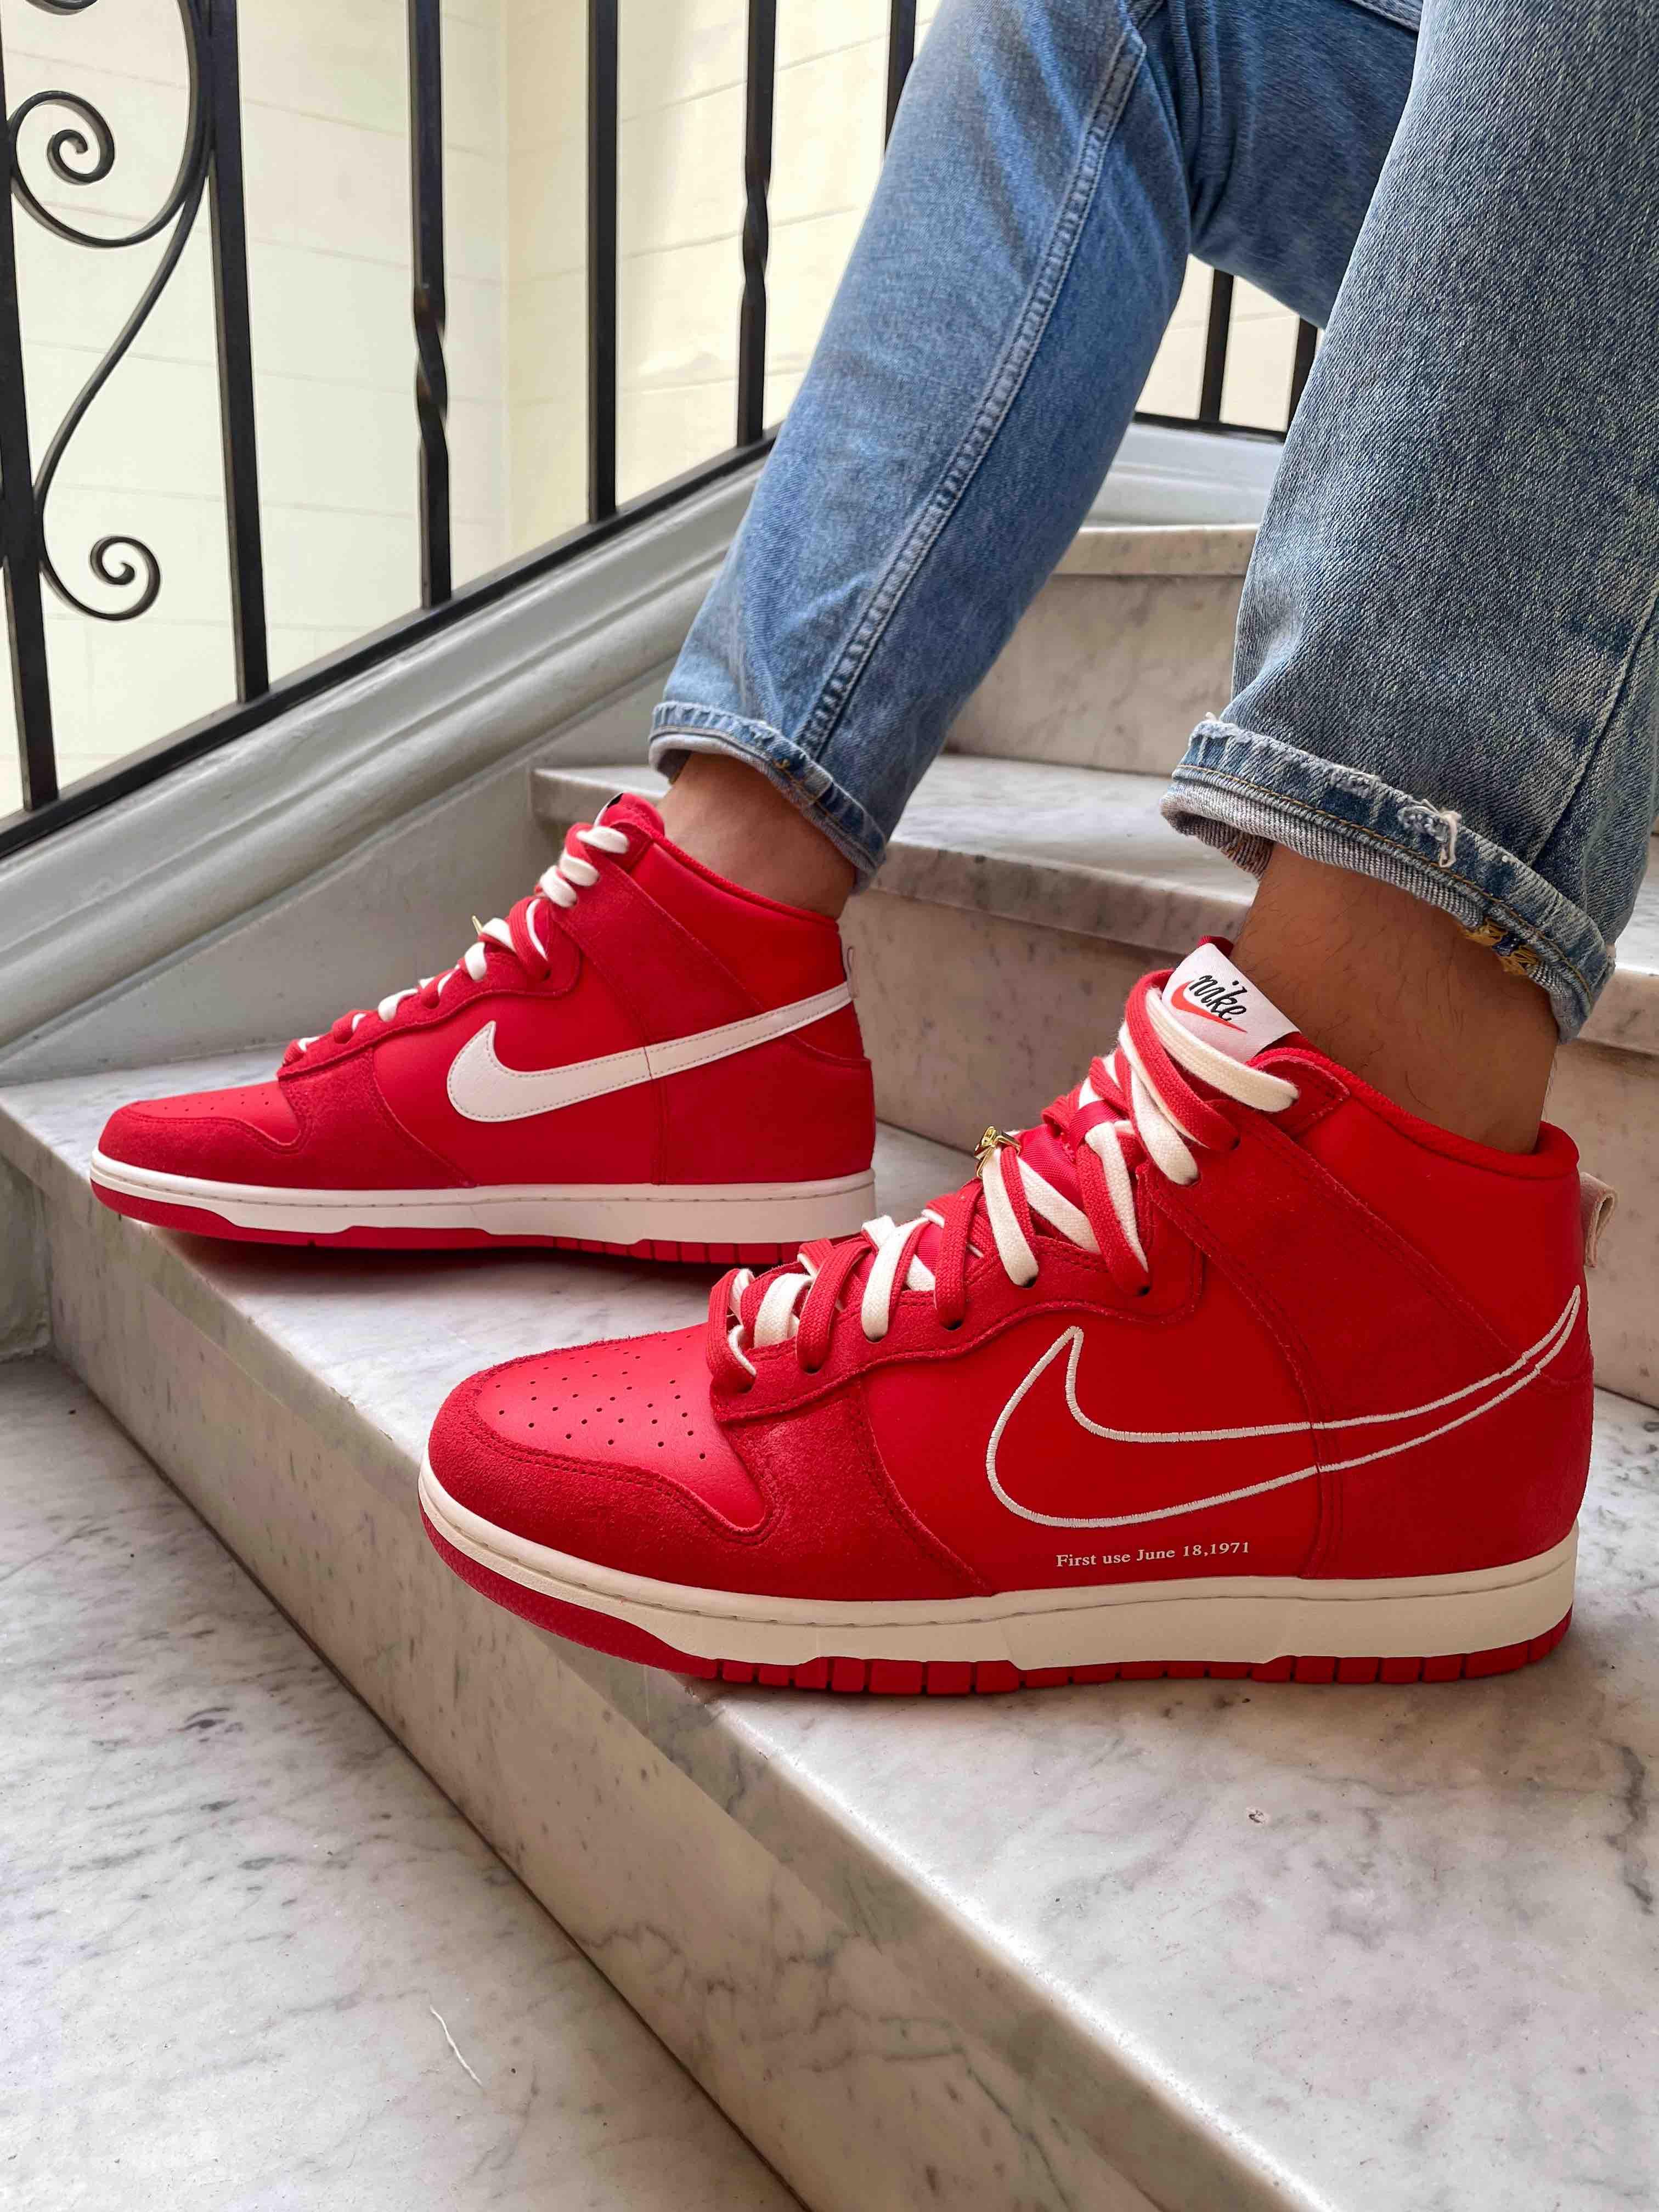 Nike Dunk High SE First Use